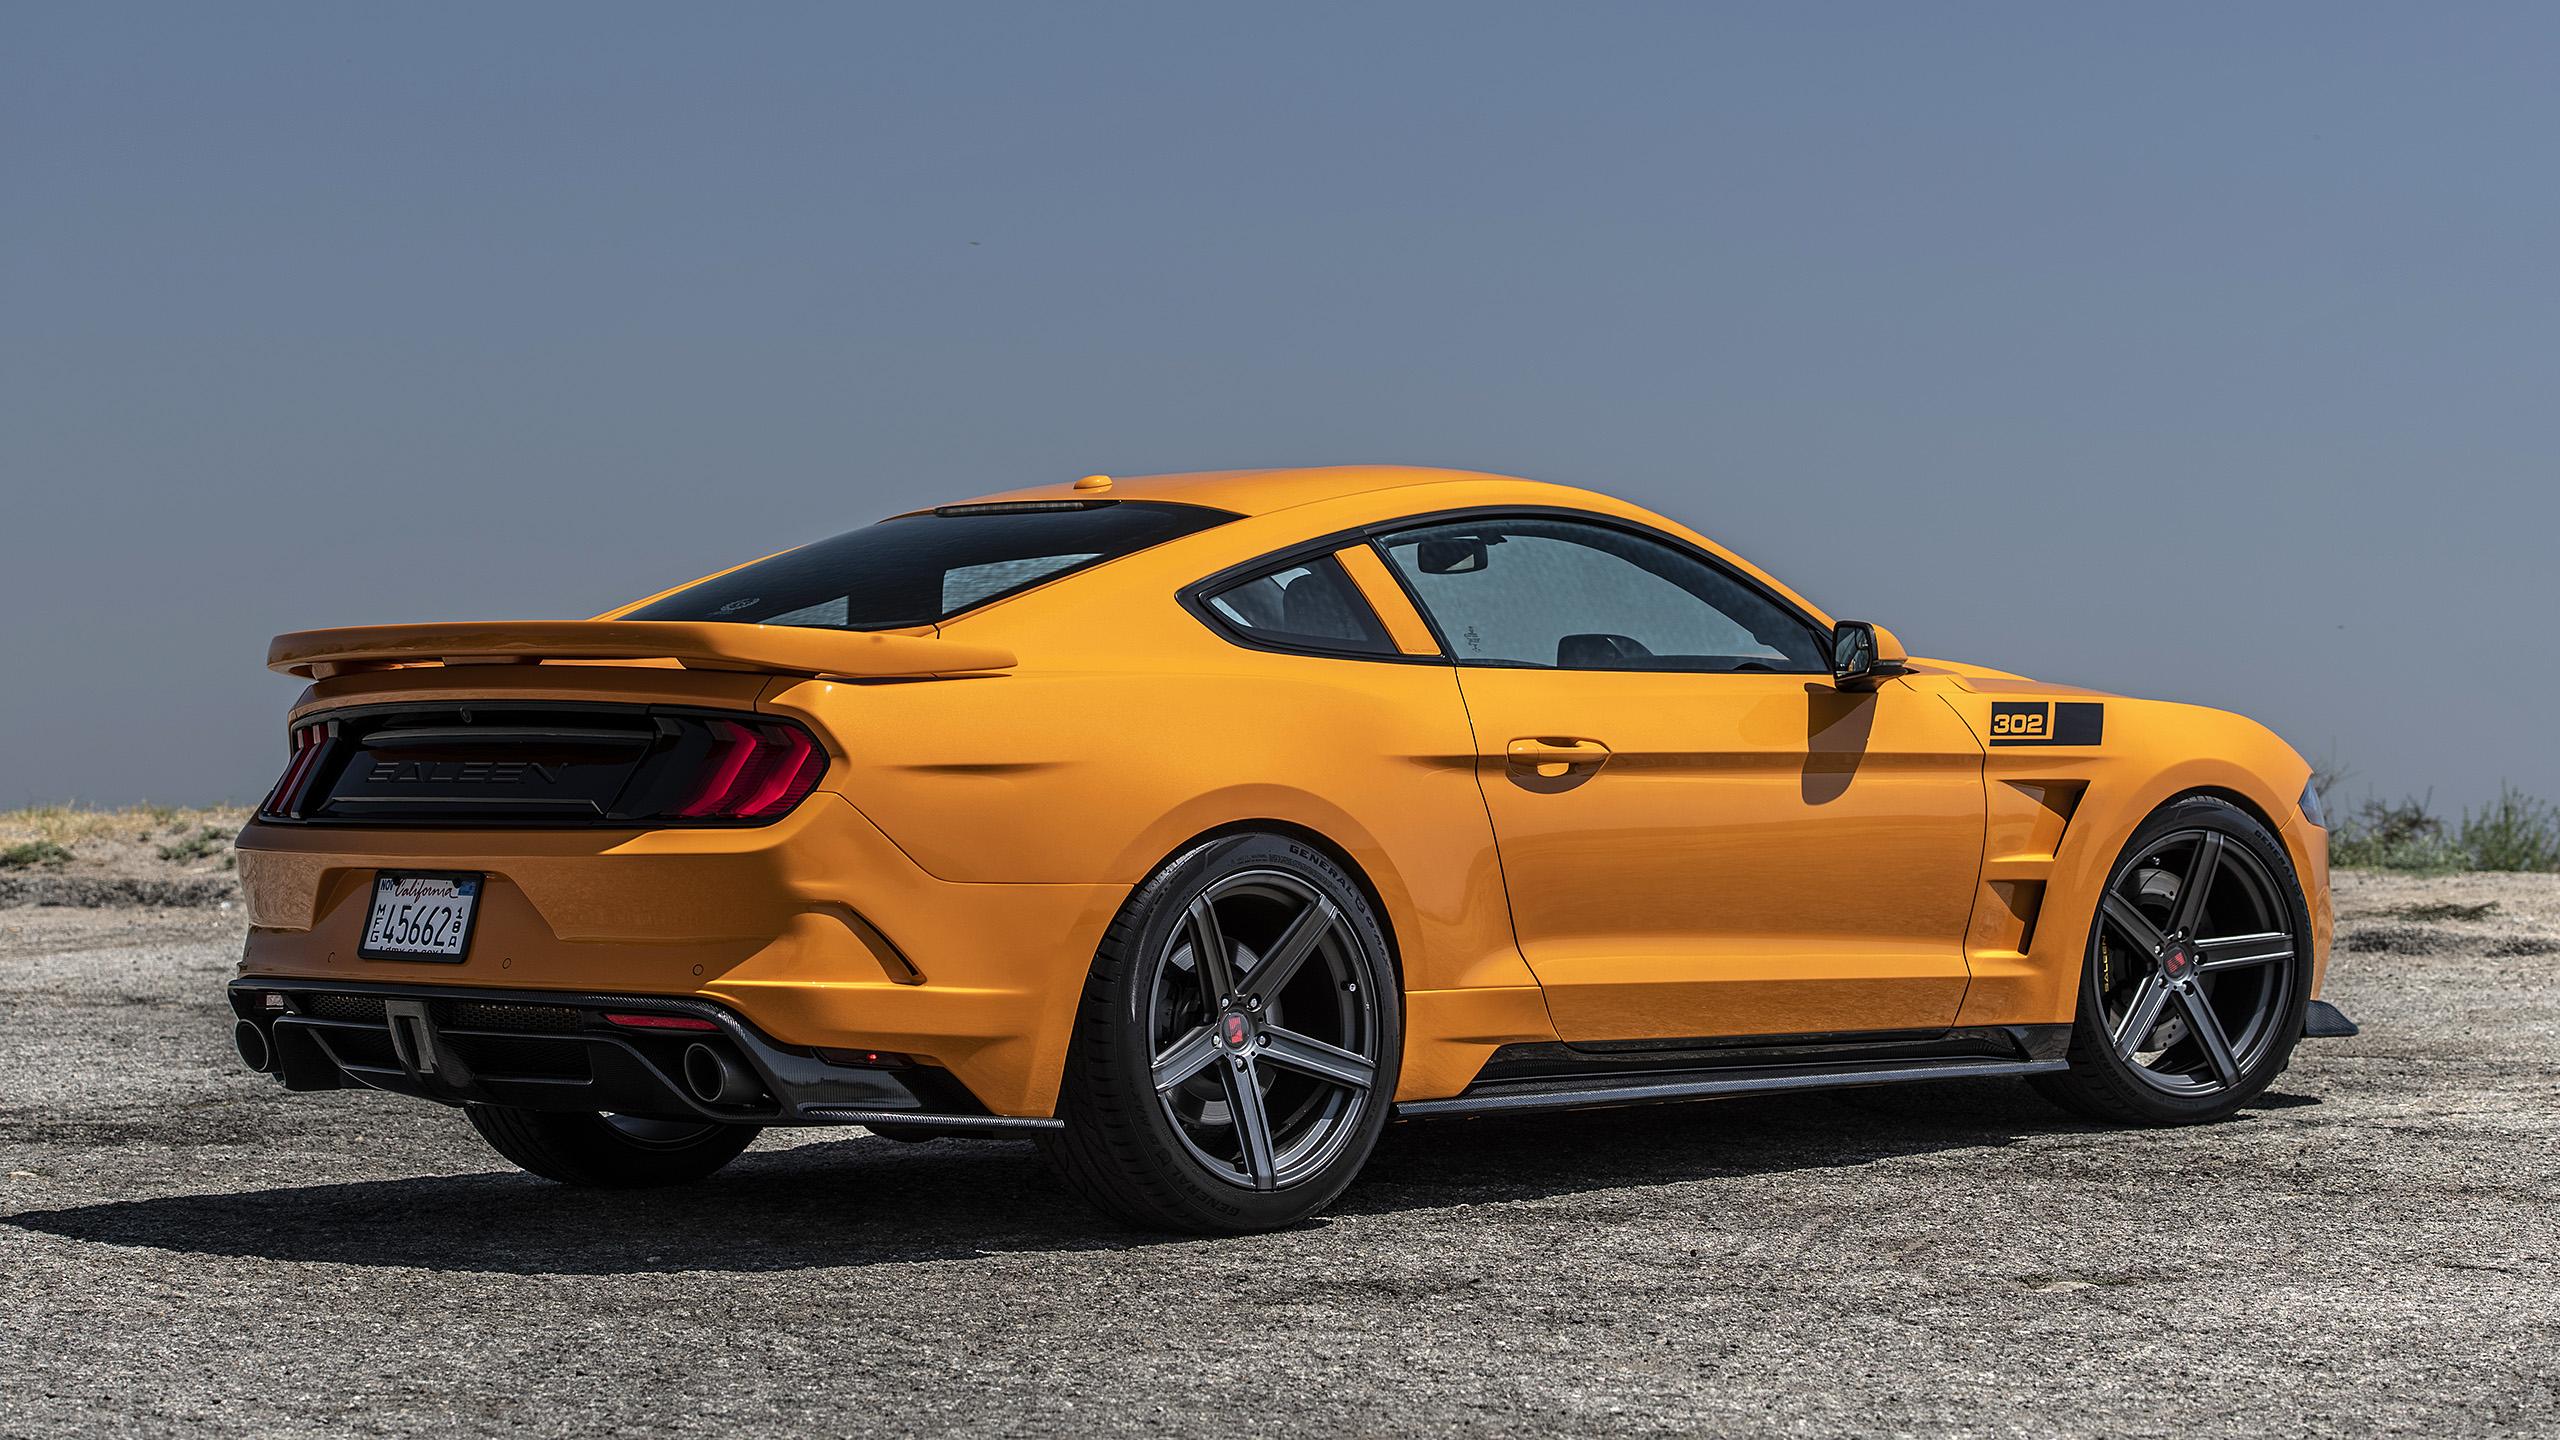 Saleen Mustang For Sale